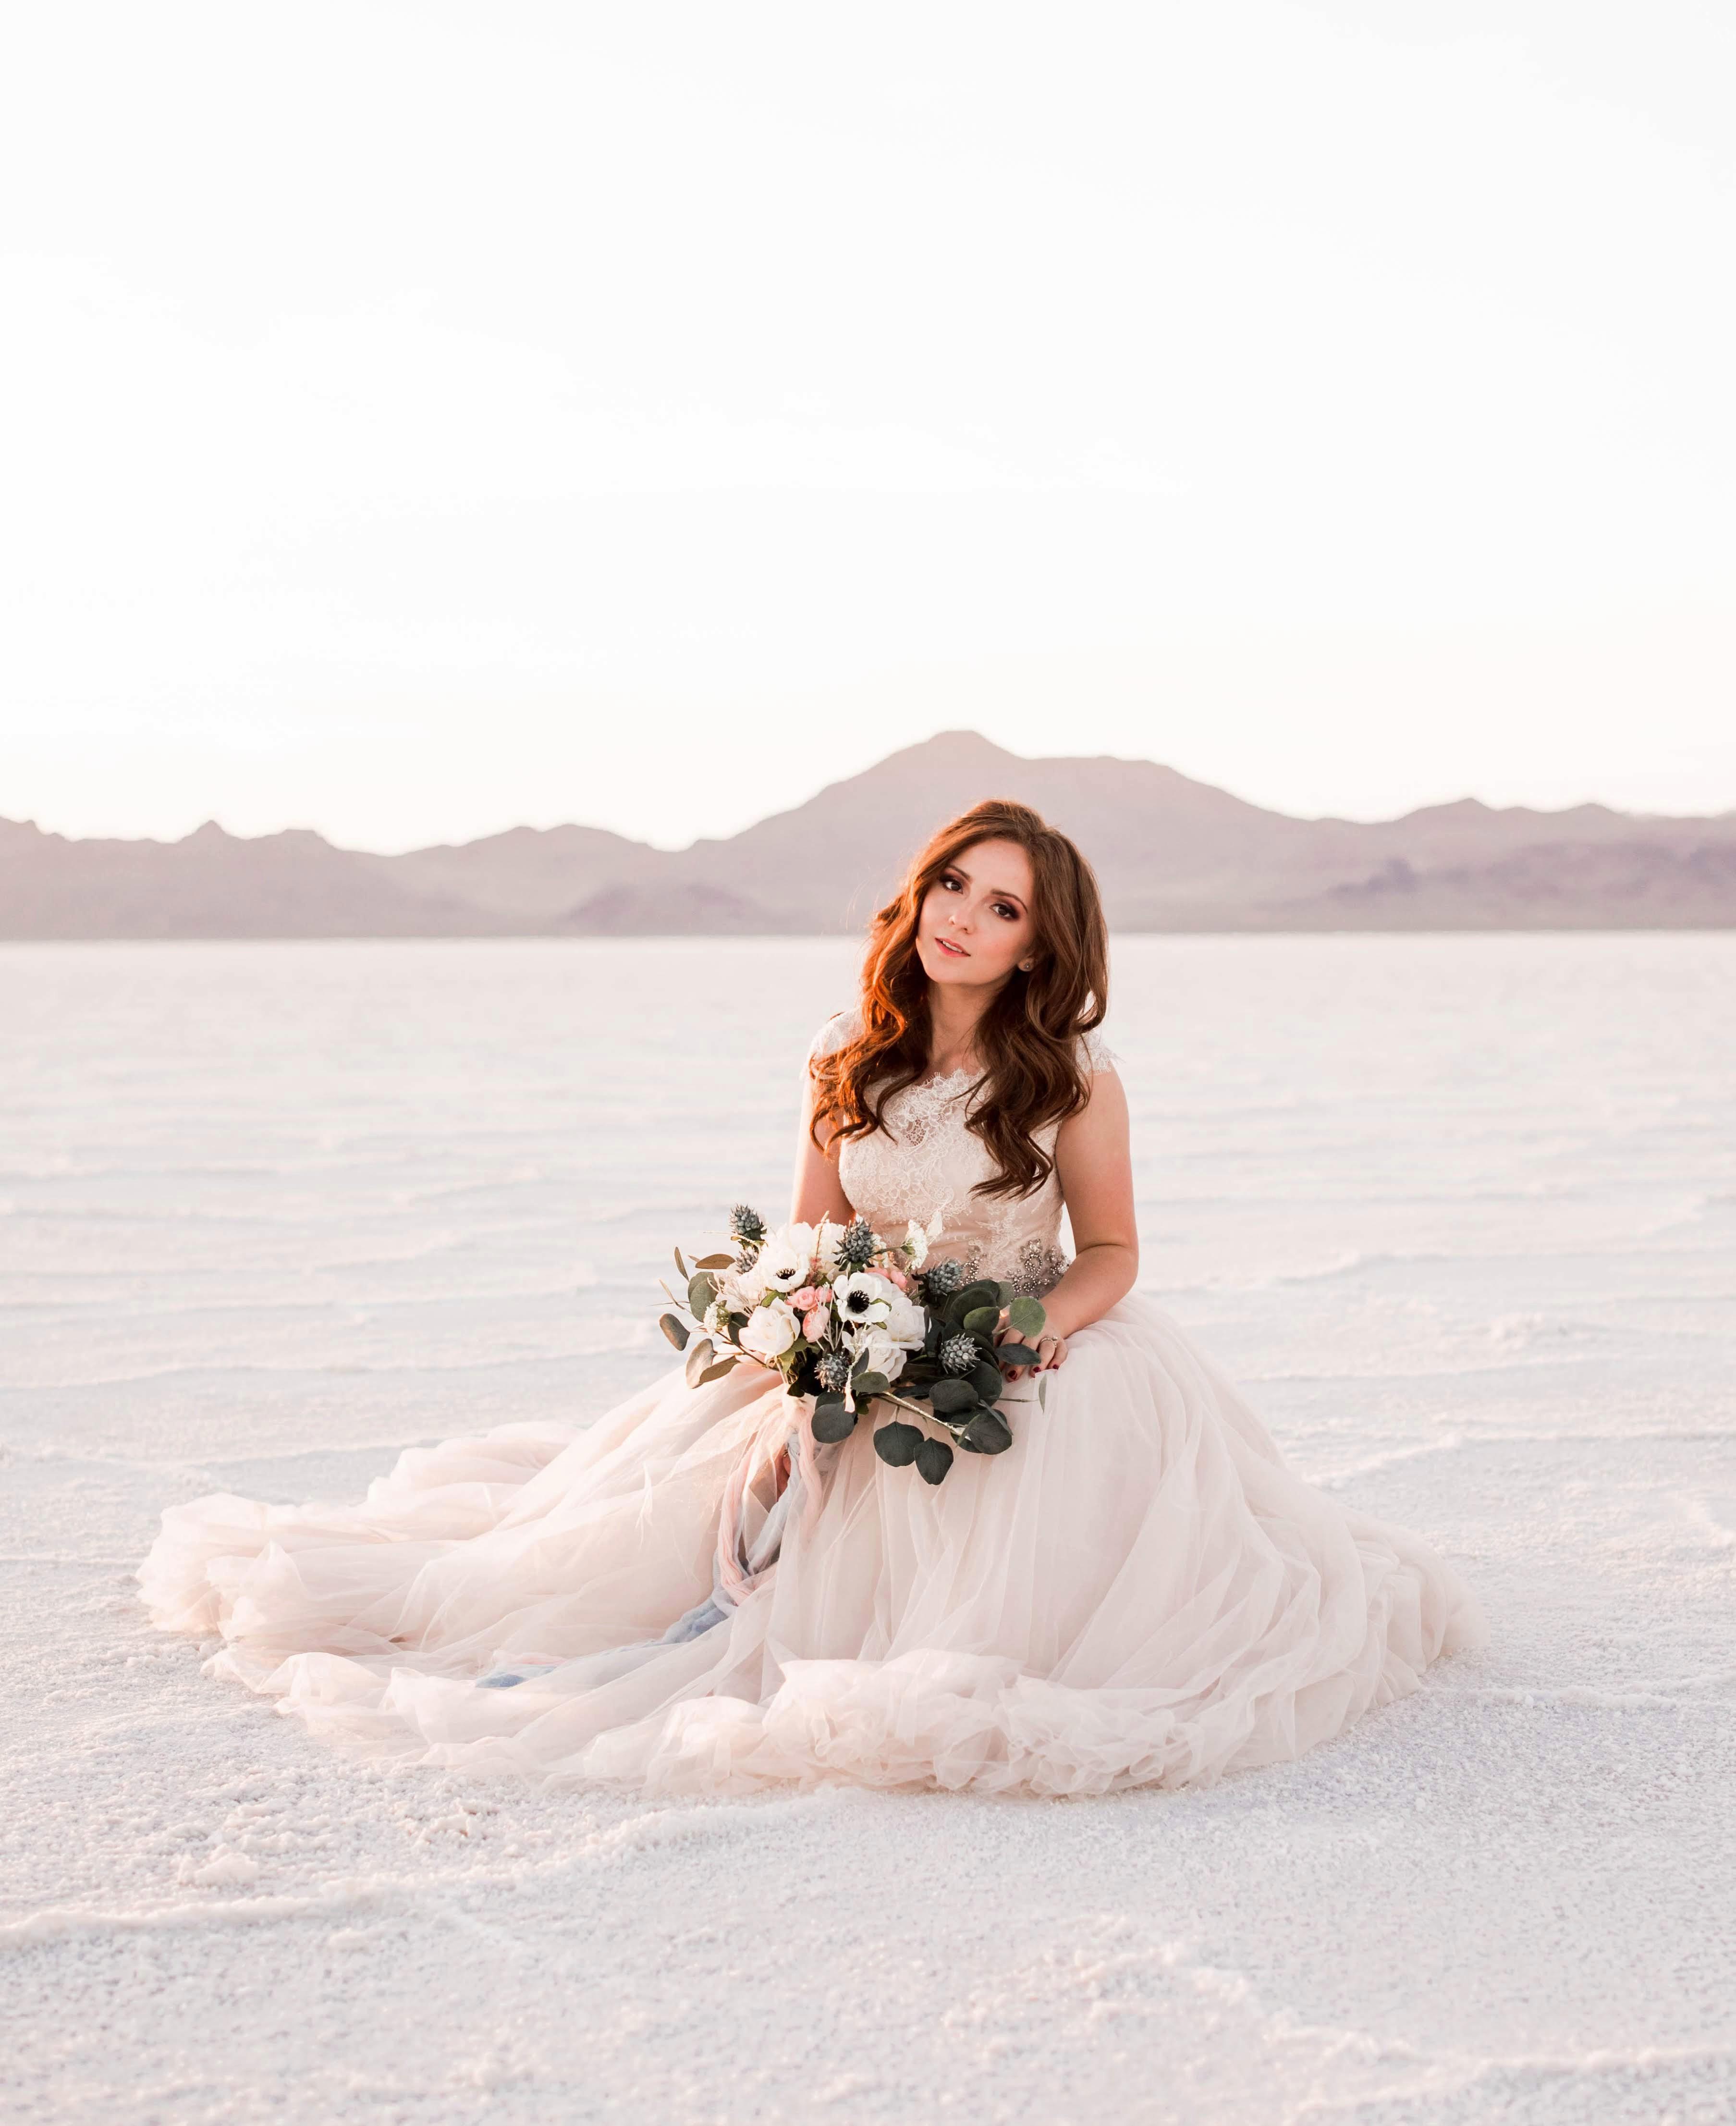 Wedding Dress Rentals | Something Borrowed Bridal Rentals ...